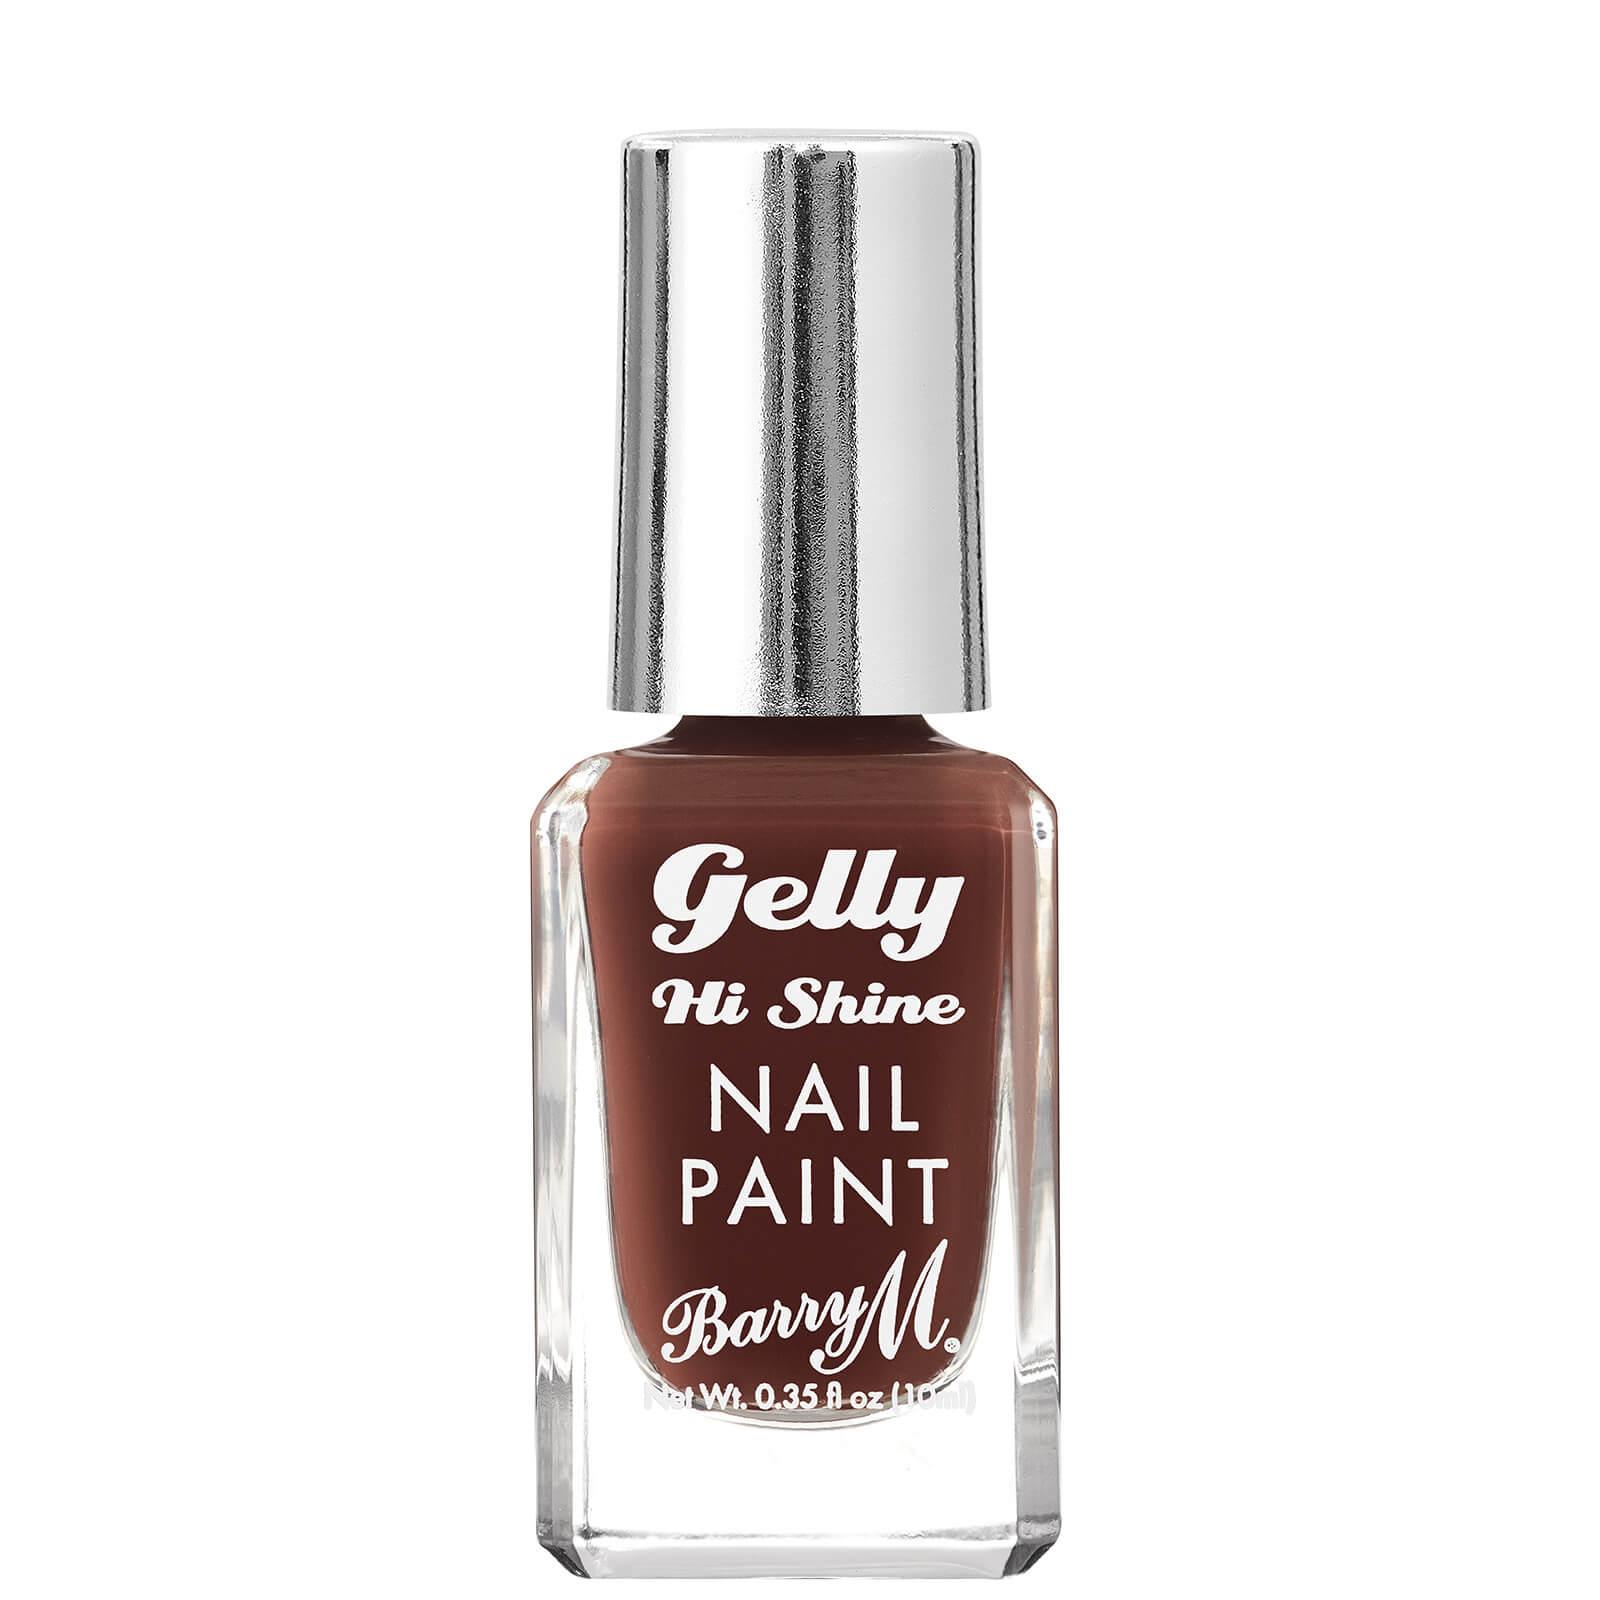 Купить Barry M Cosmetics Gelly Nail Paint 10ml (Various Shades) - Cappuccino